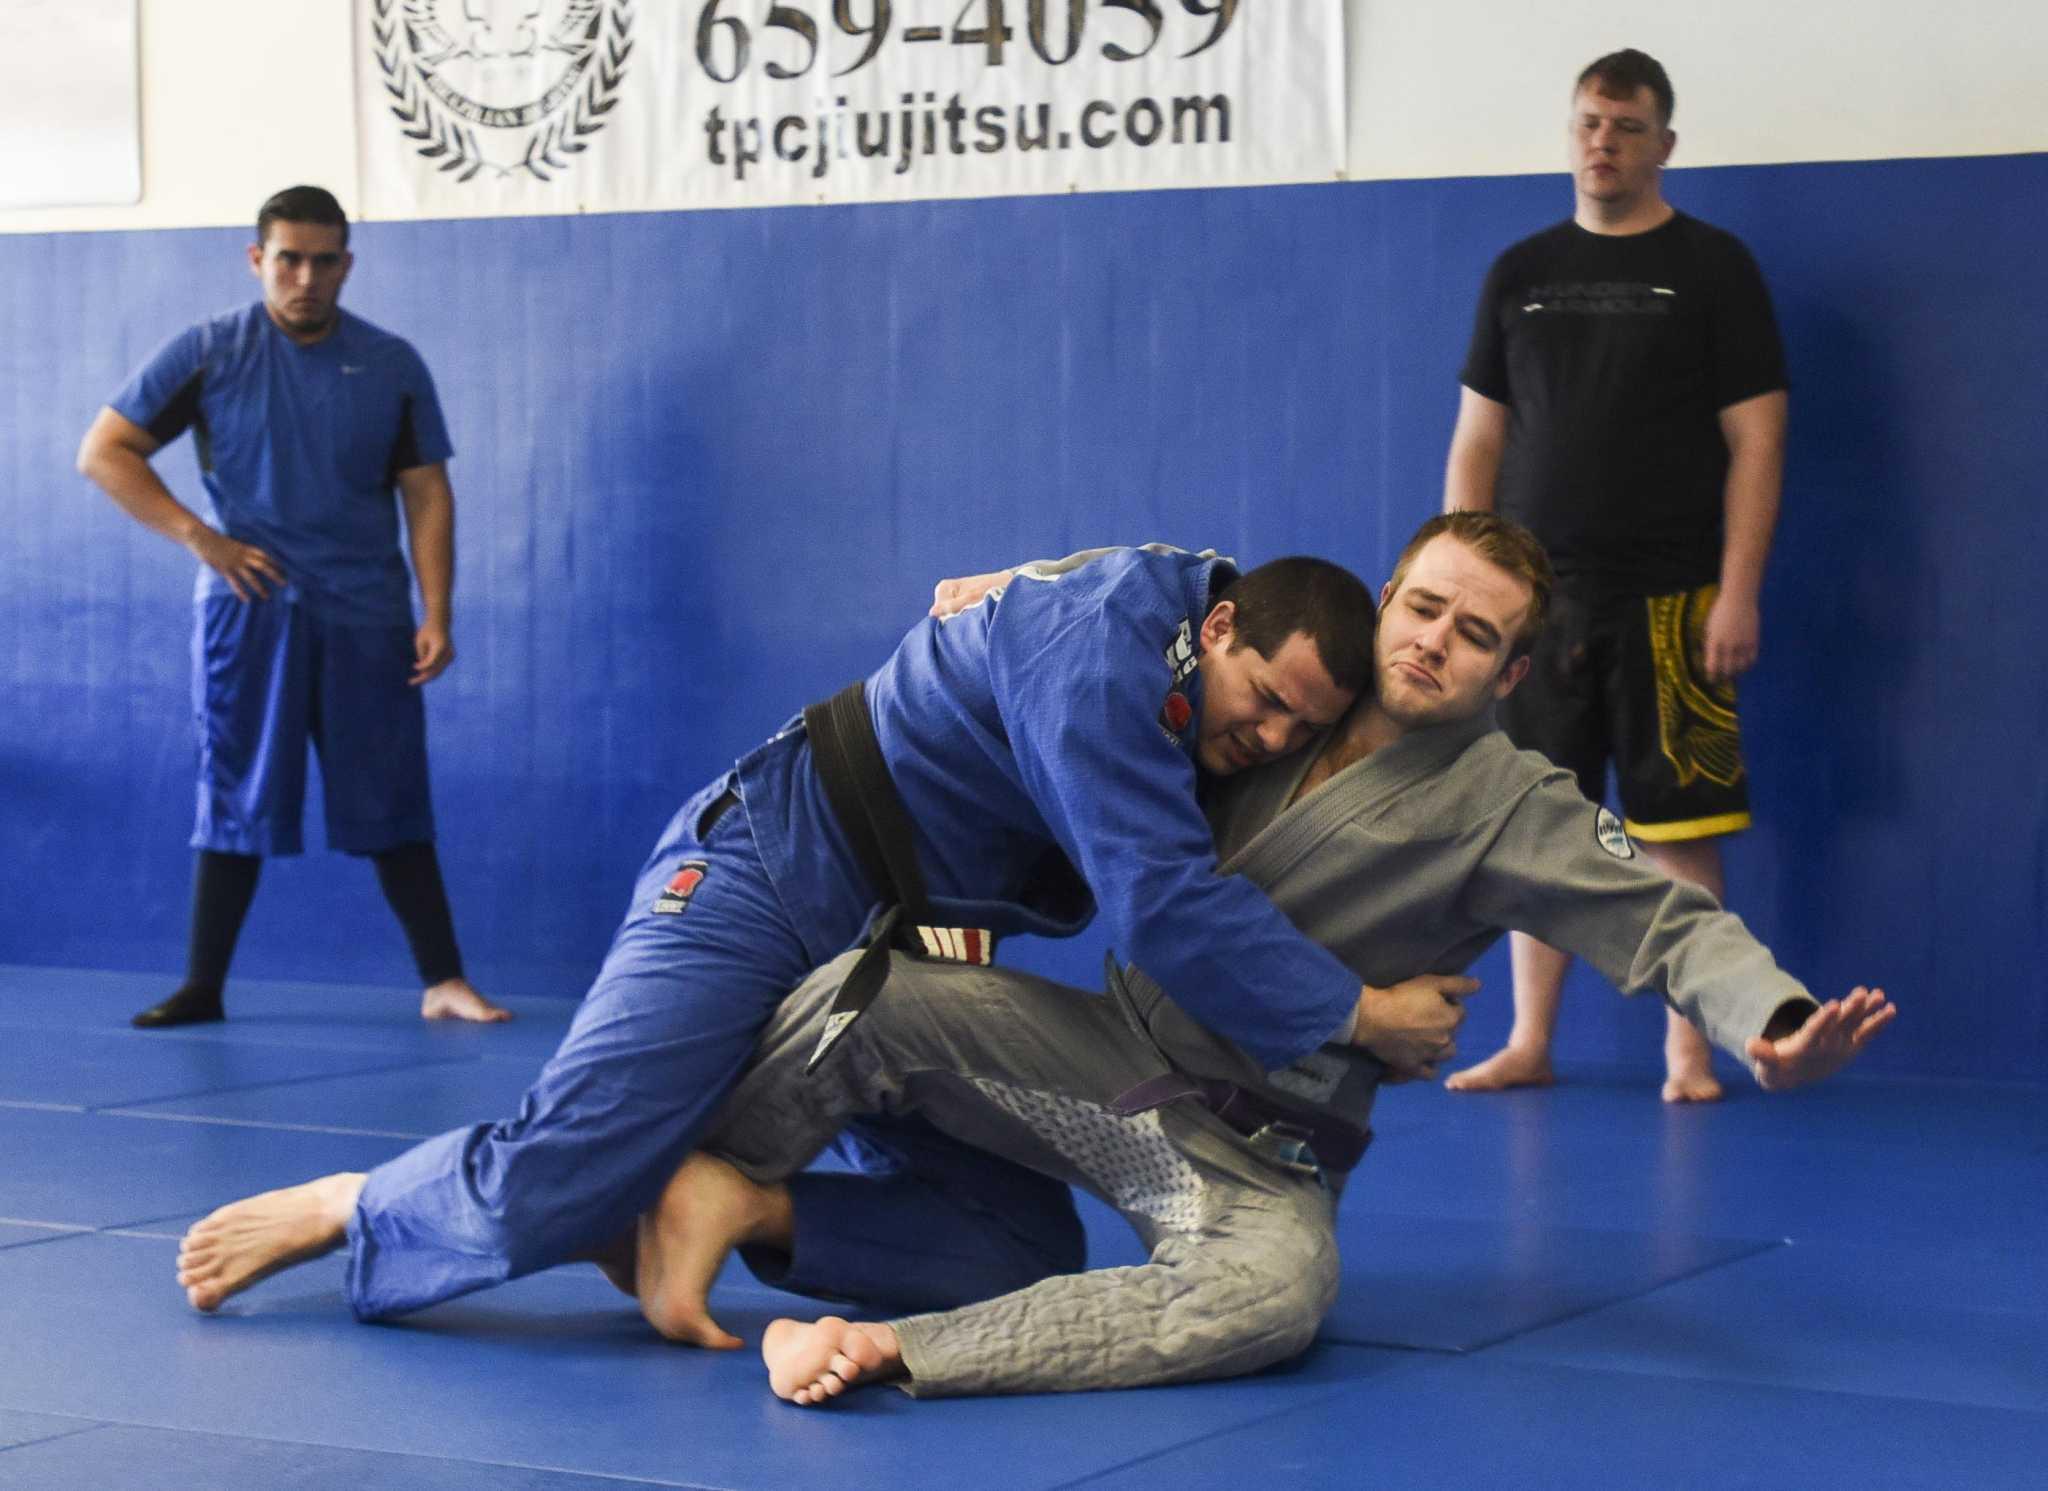 UFC champ to visit Beaumont jiu-jitsu studio